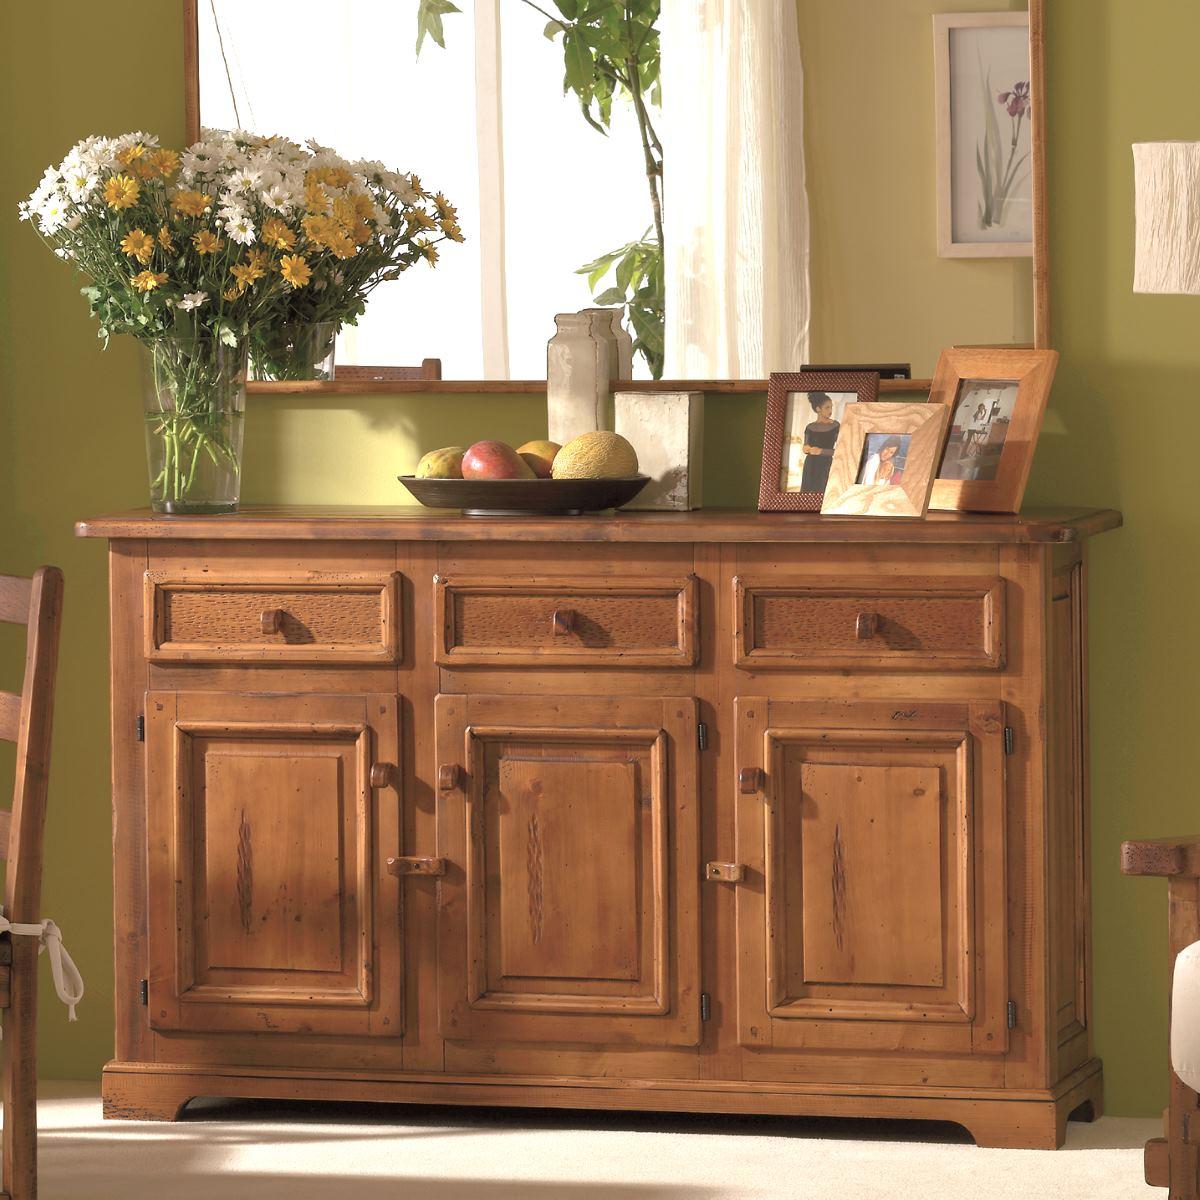 Adesivo De Mesversario ~ Aparador rústico de madera 159cm Ecorústico venta de muebles